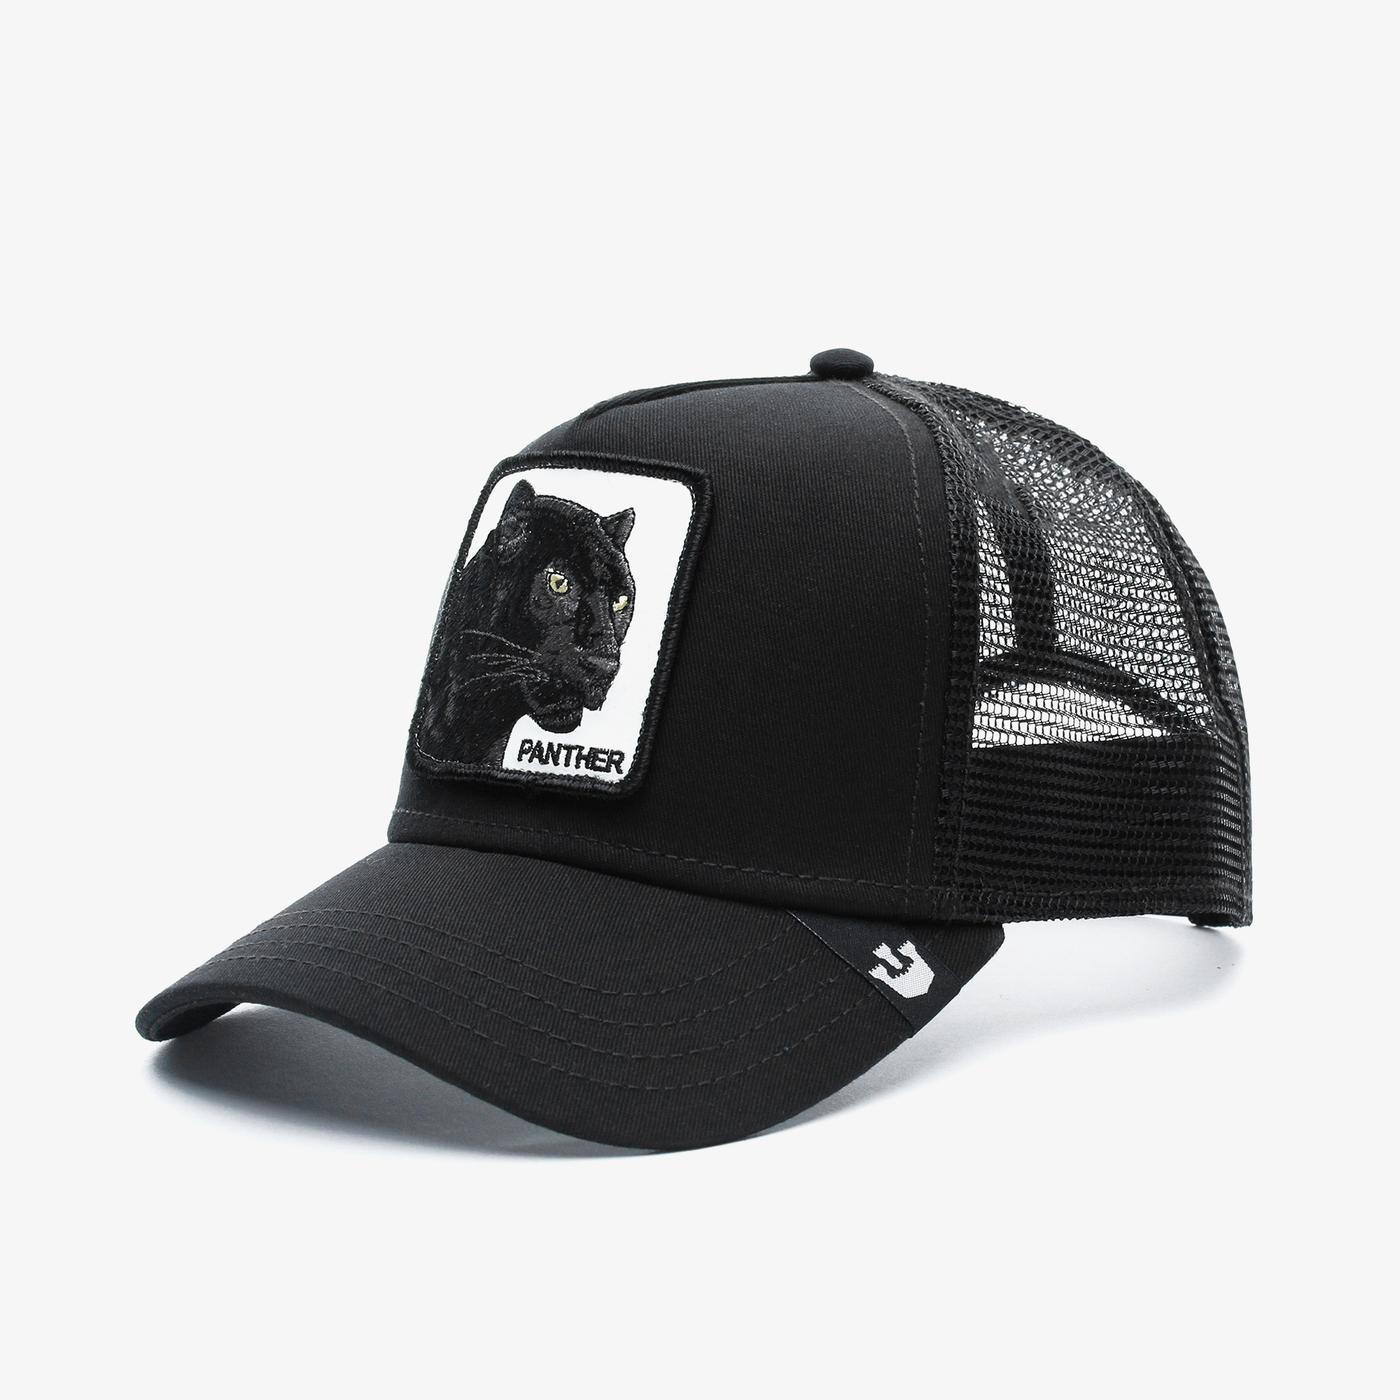 Goorin Bros Black Panther Unisex Siyah Şapka